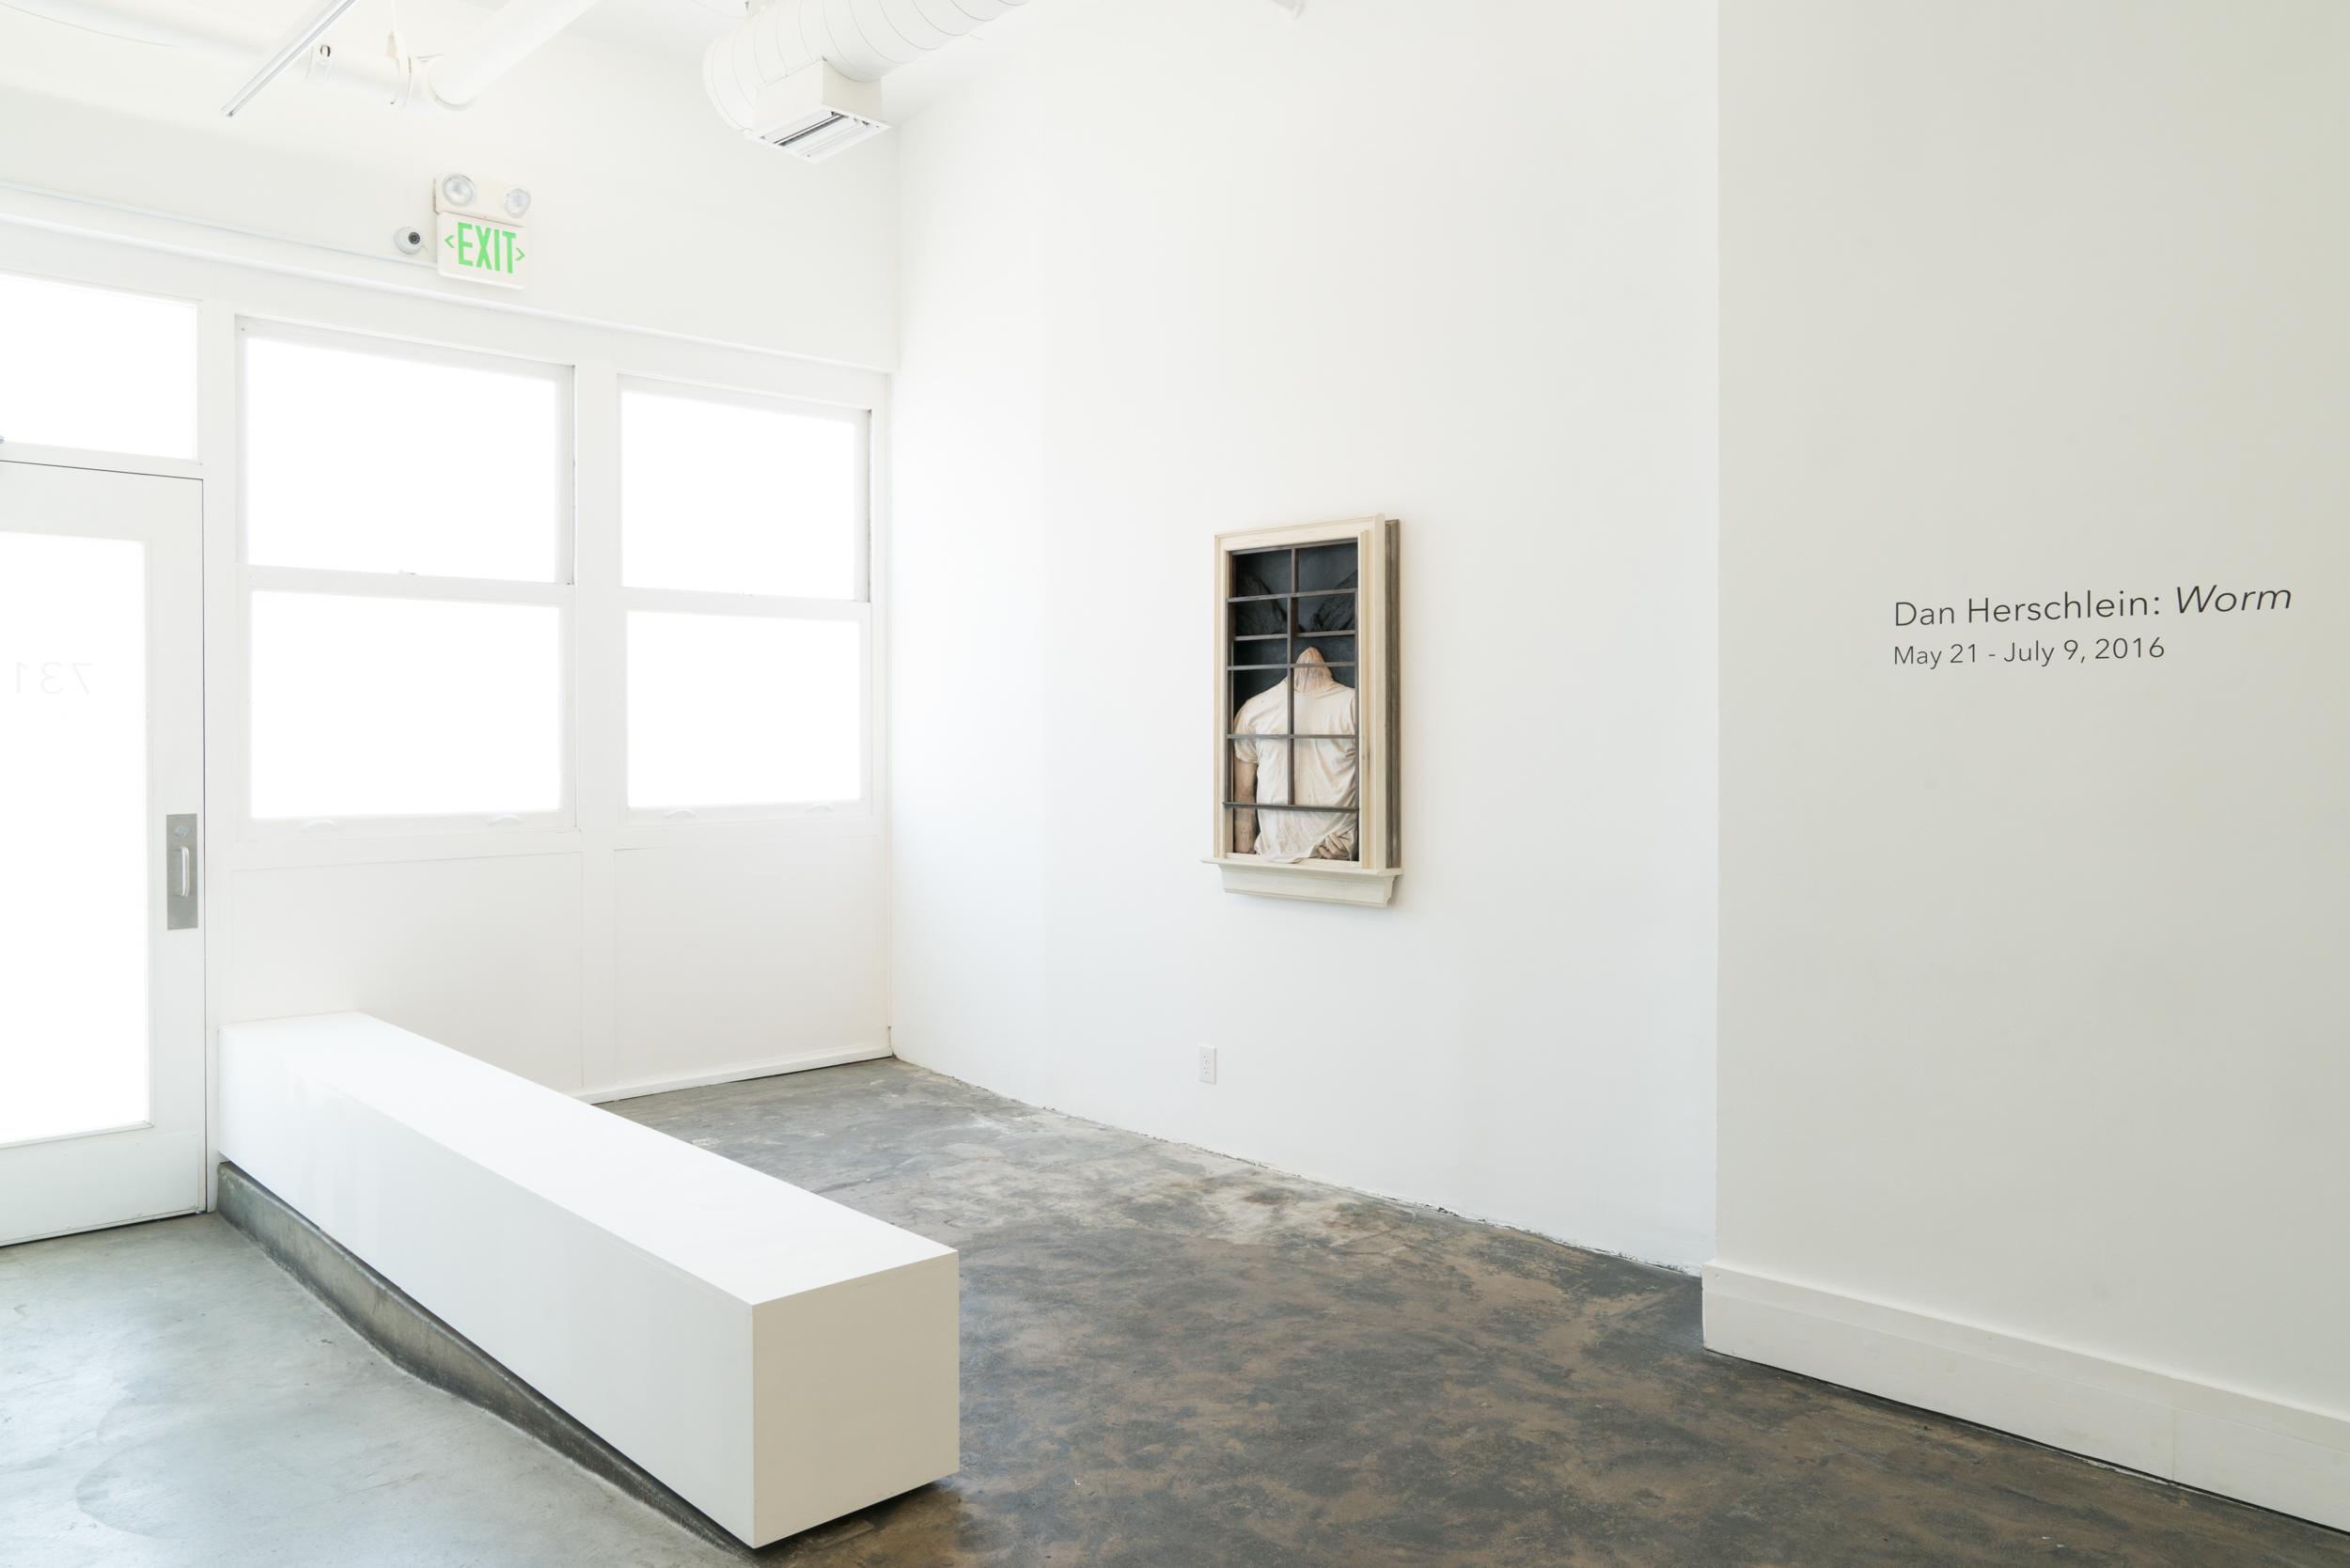 Dan Herschlein - Worm - AALA Gallery - 2016 - Install Images - Medium Res-1.jpg